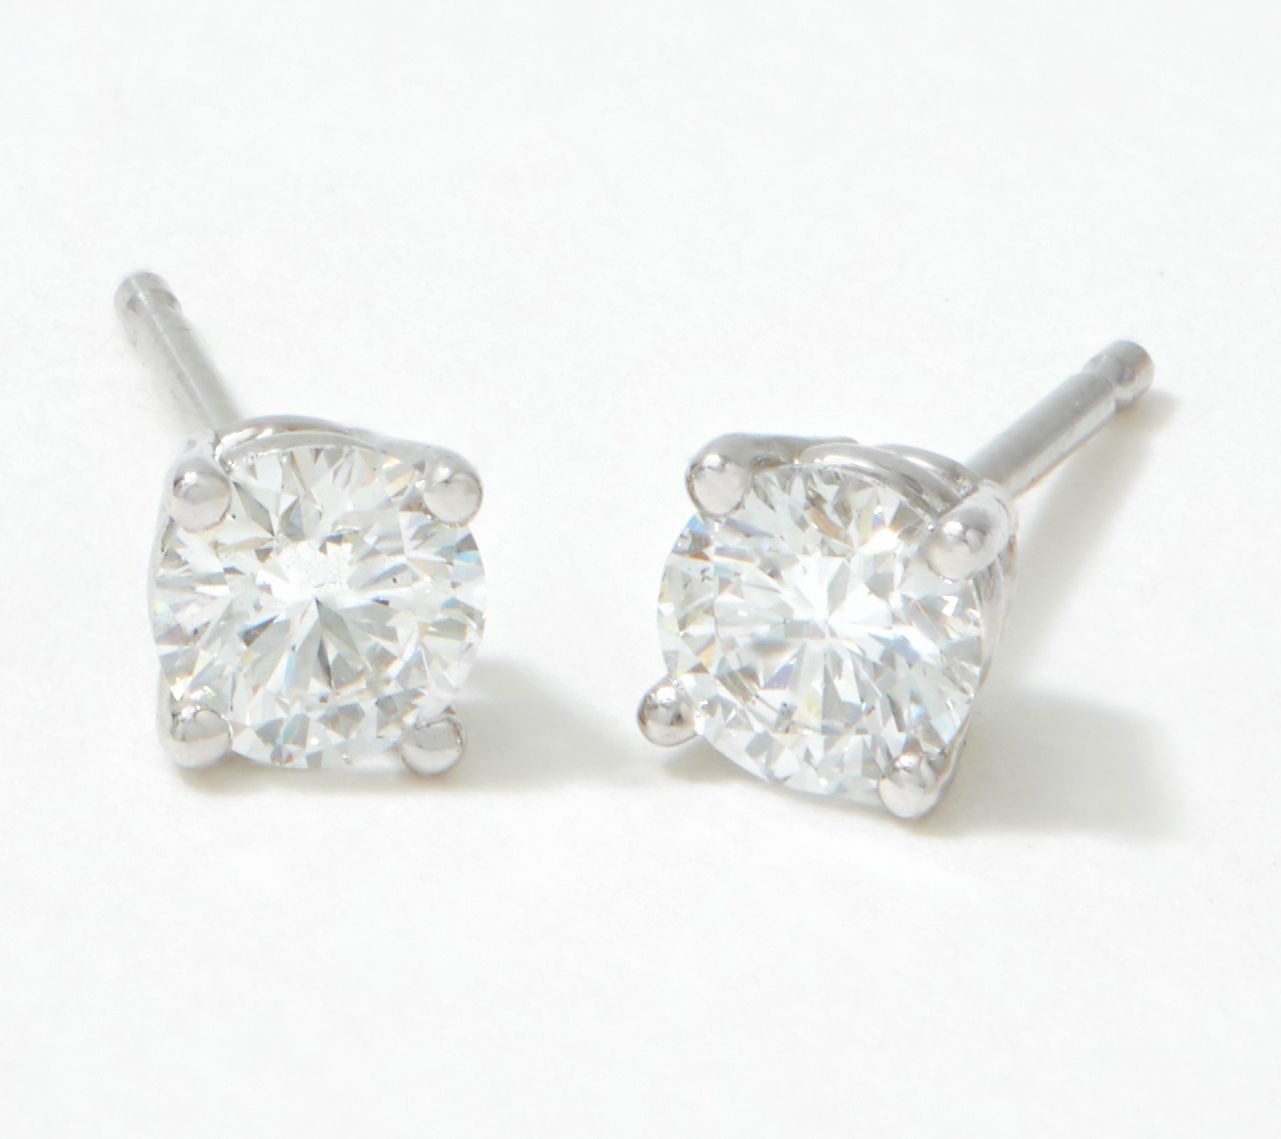 Fire Light Lab Grown Diamond 14k Gold Stud Earrings 1 2cttw Qvc